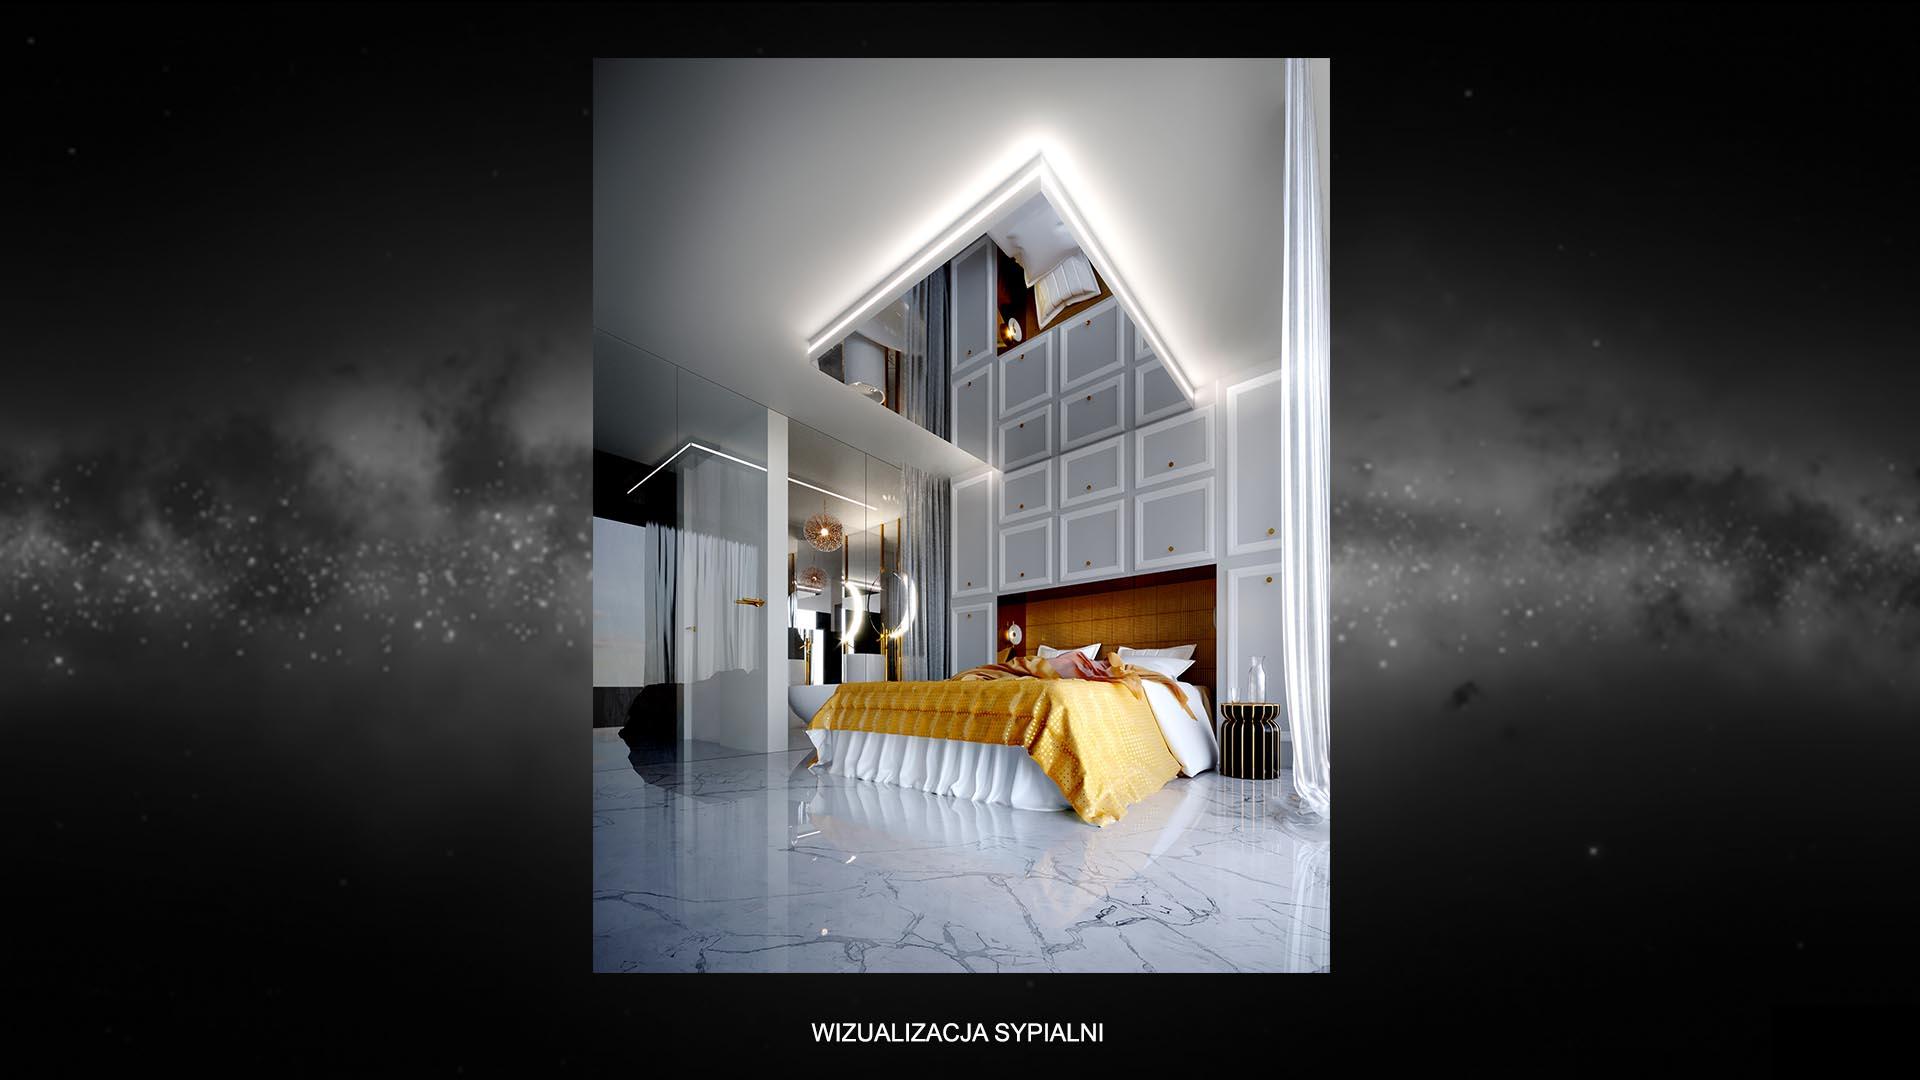 Apartament kometa - wizualizacja sypialni 1